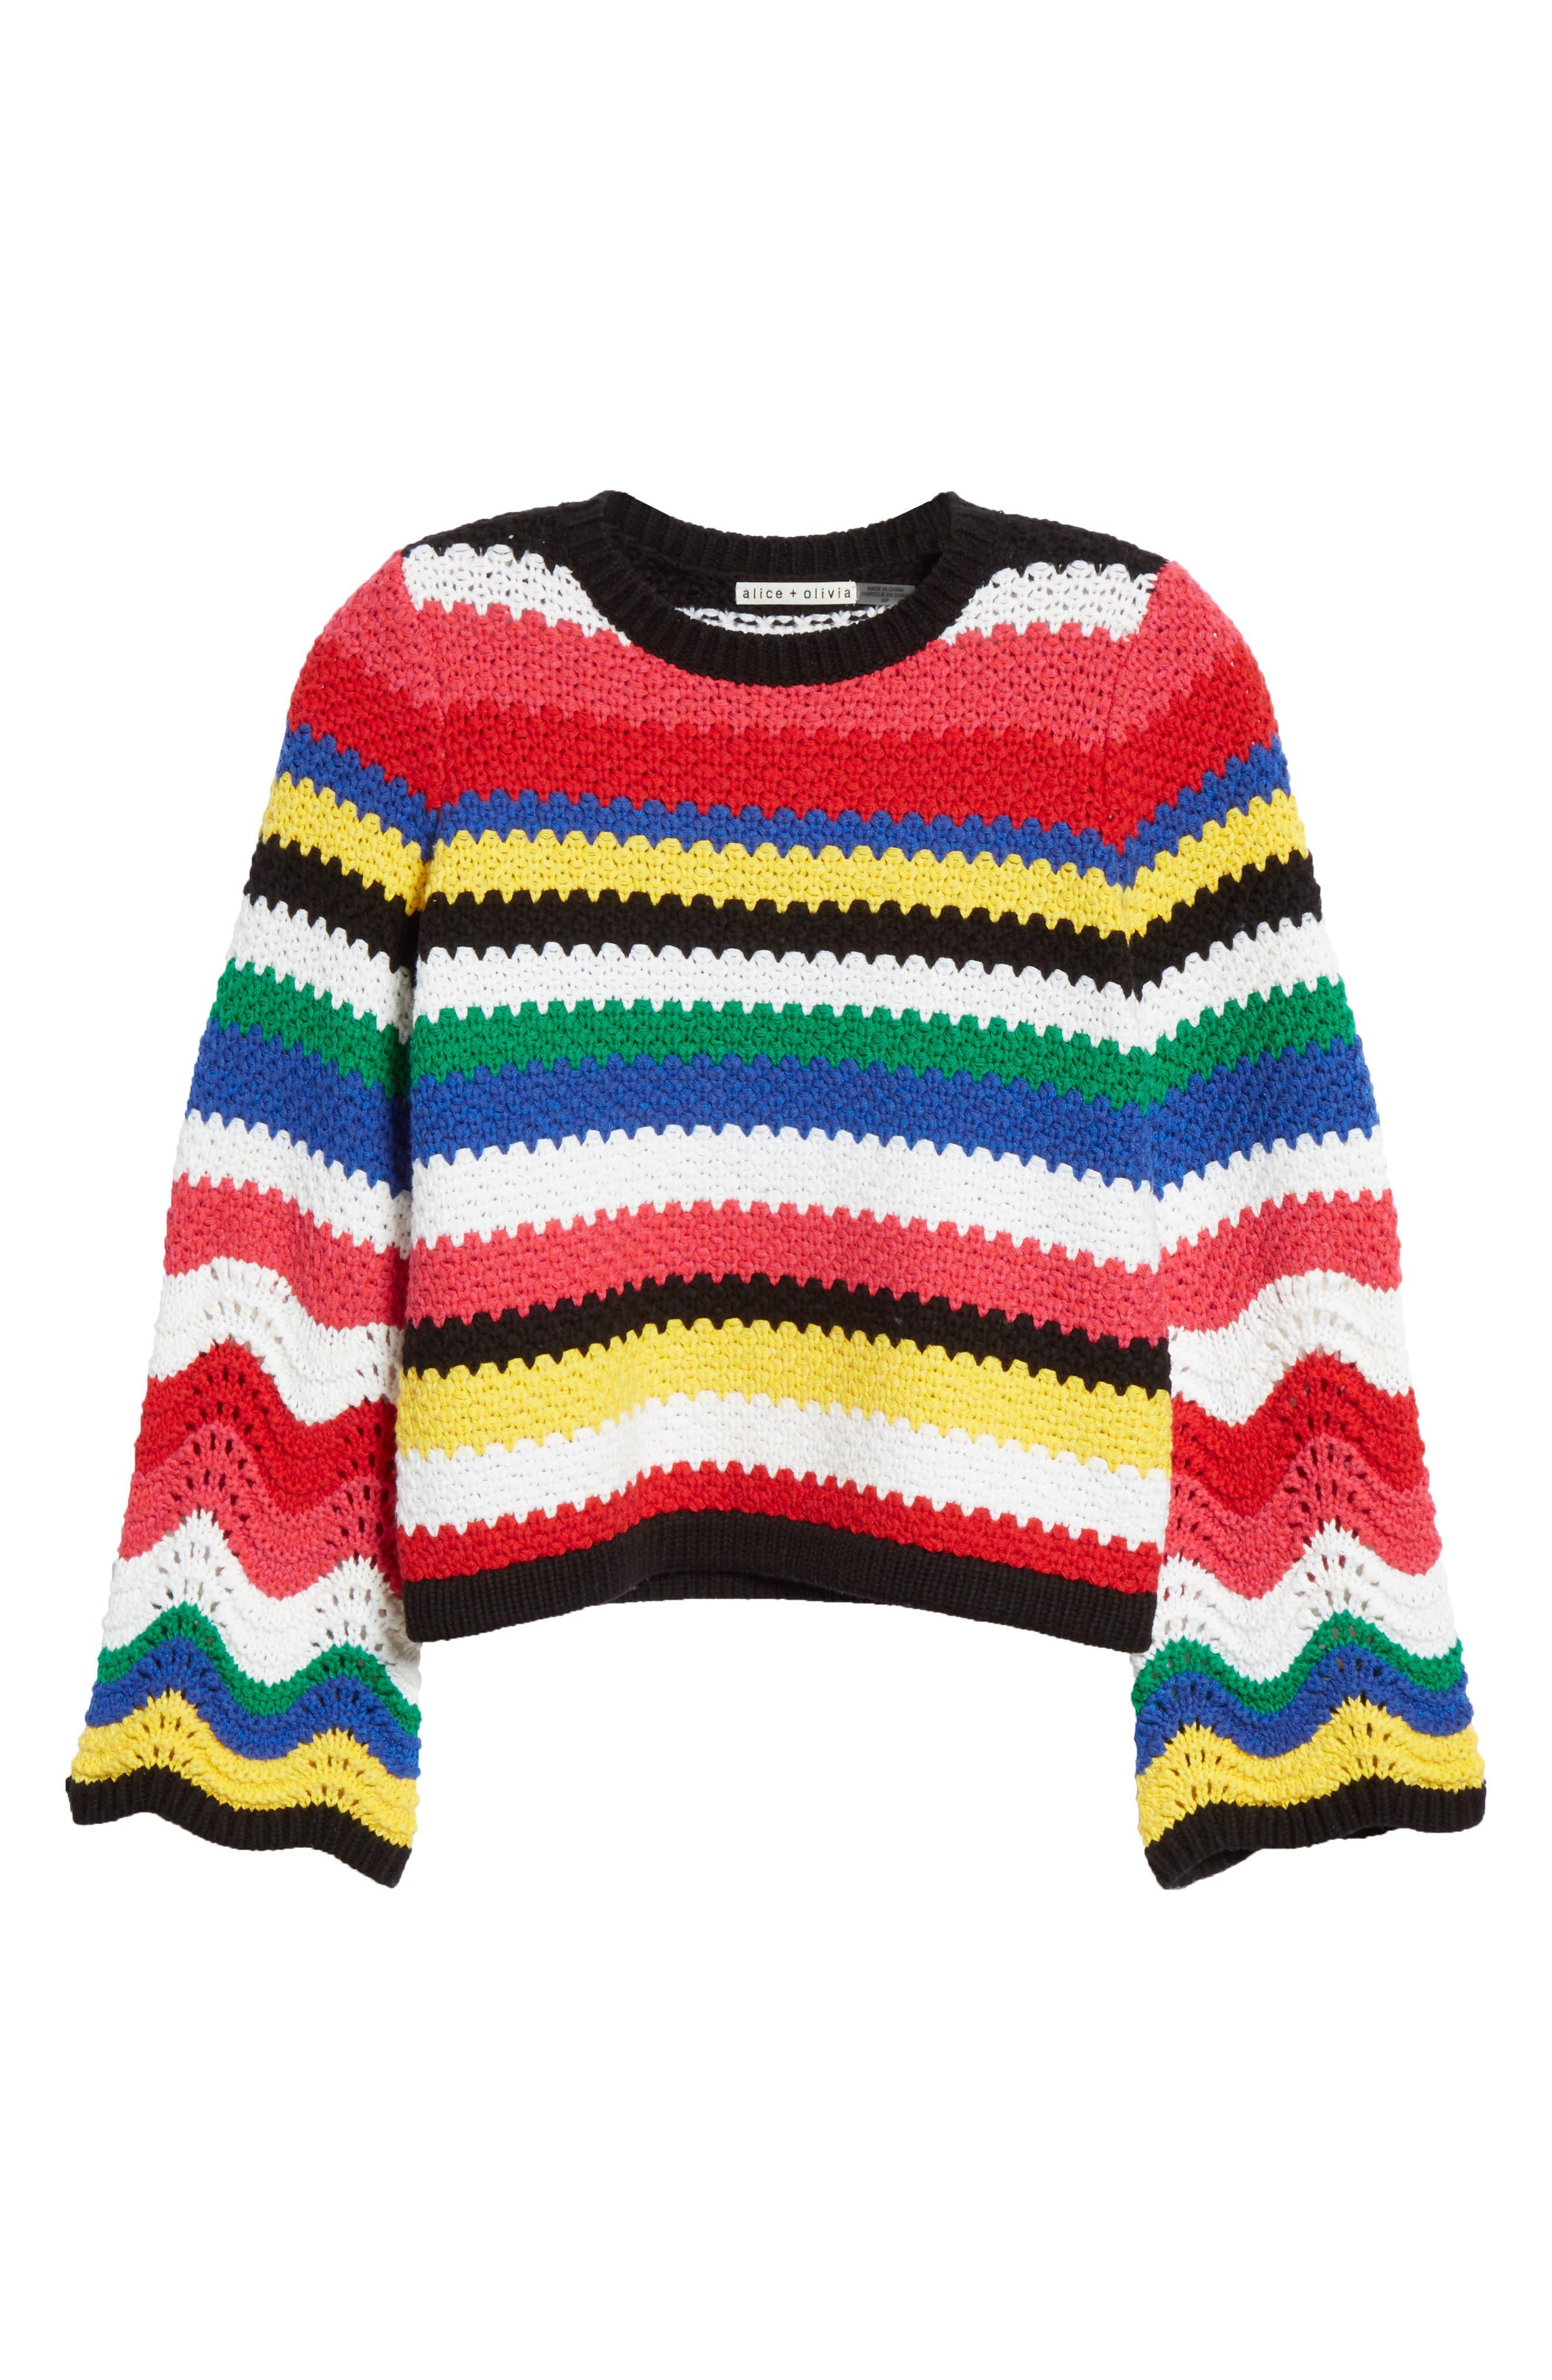 ALICE + OLIVIA, Alivia Stripe Bell Sleeve Cotton Blend Sweater, Alternate thumbnail 6, color, MULTI